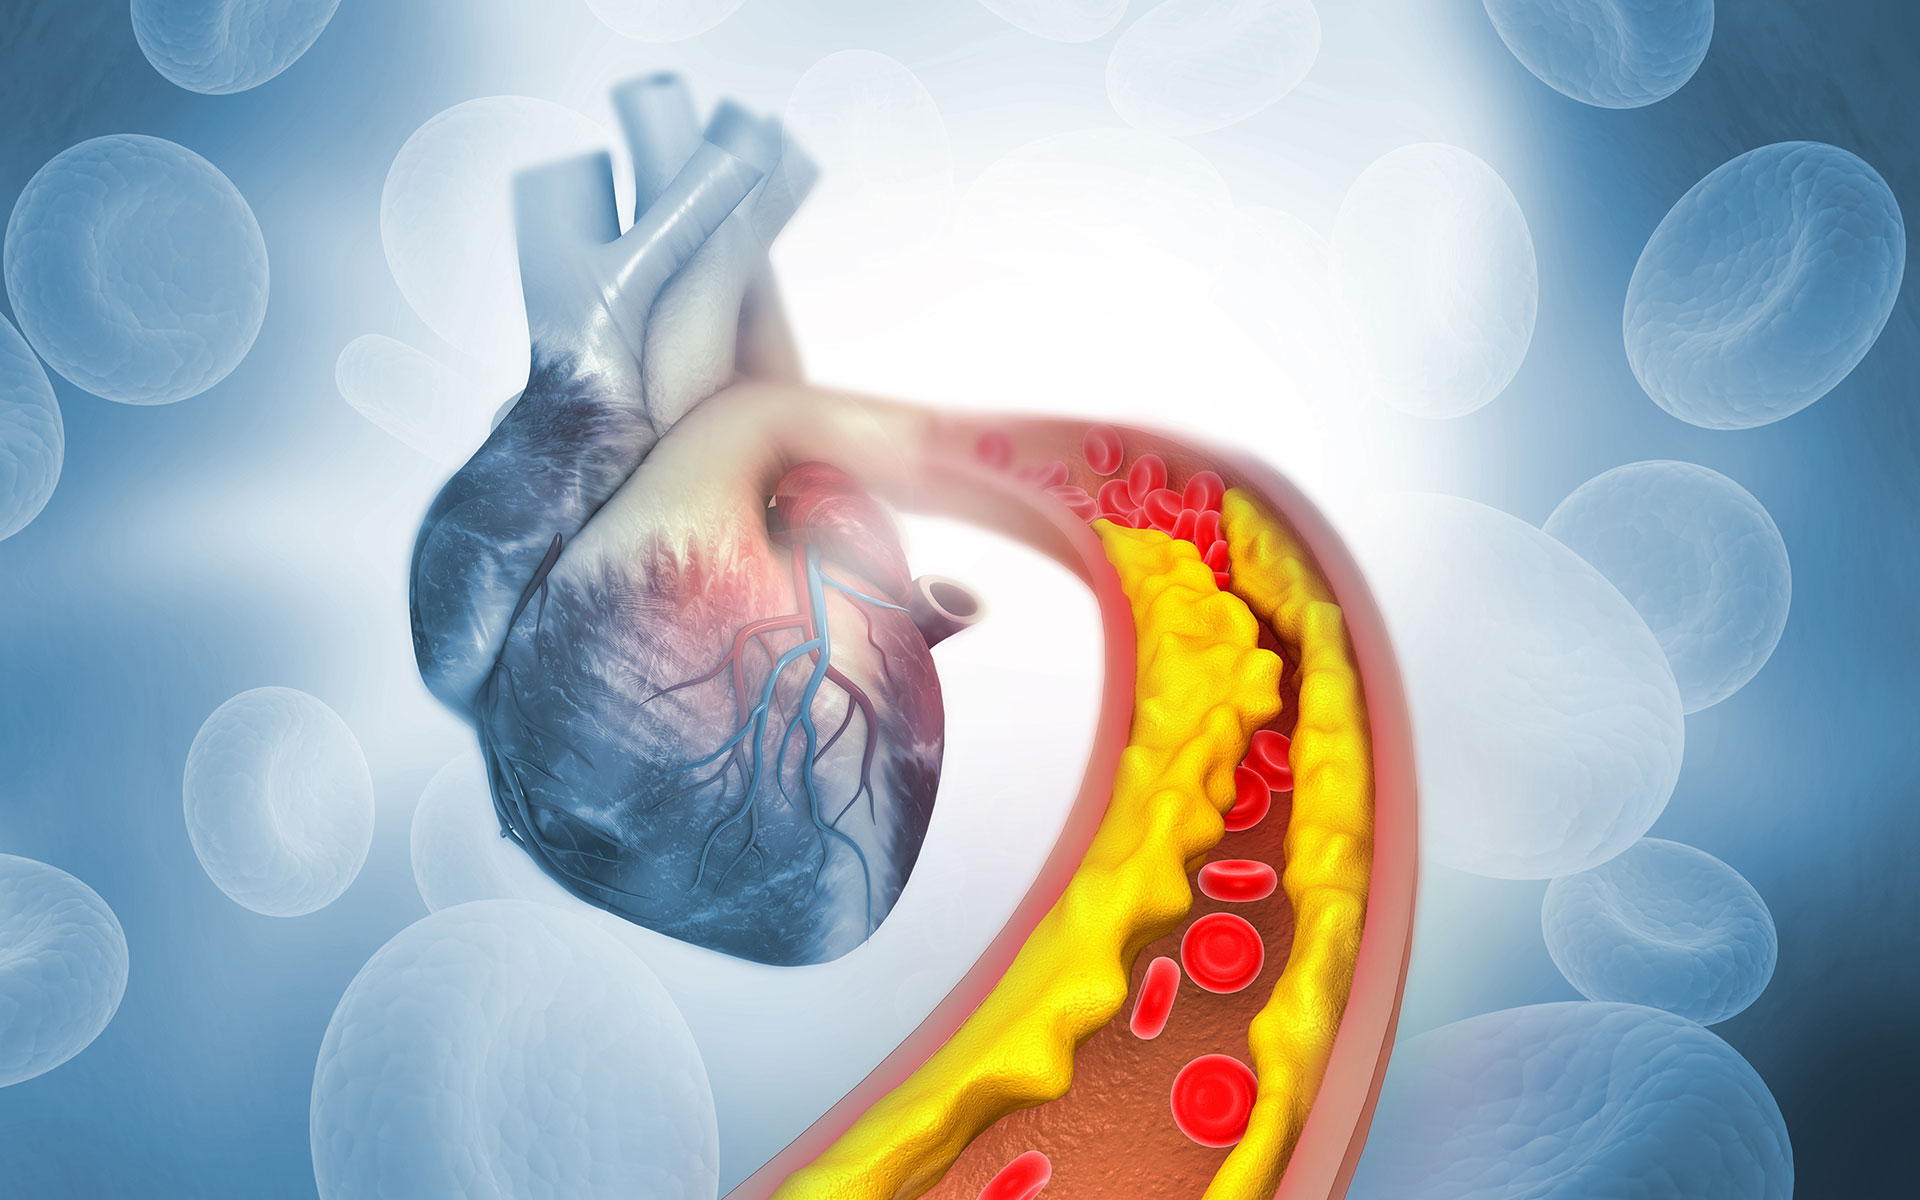 Cholesterol Plaque in Arteries